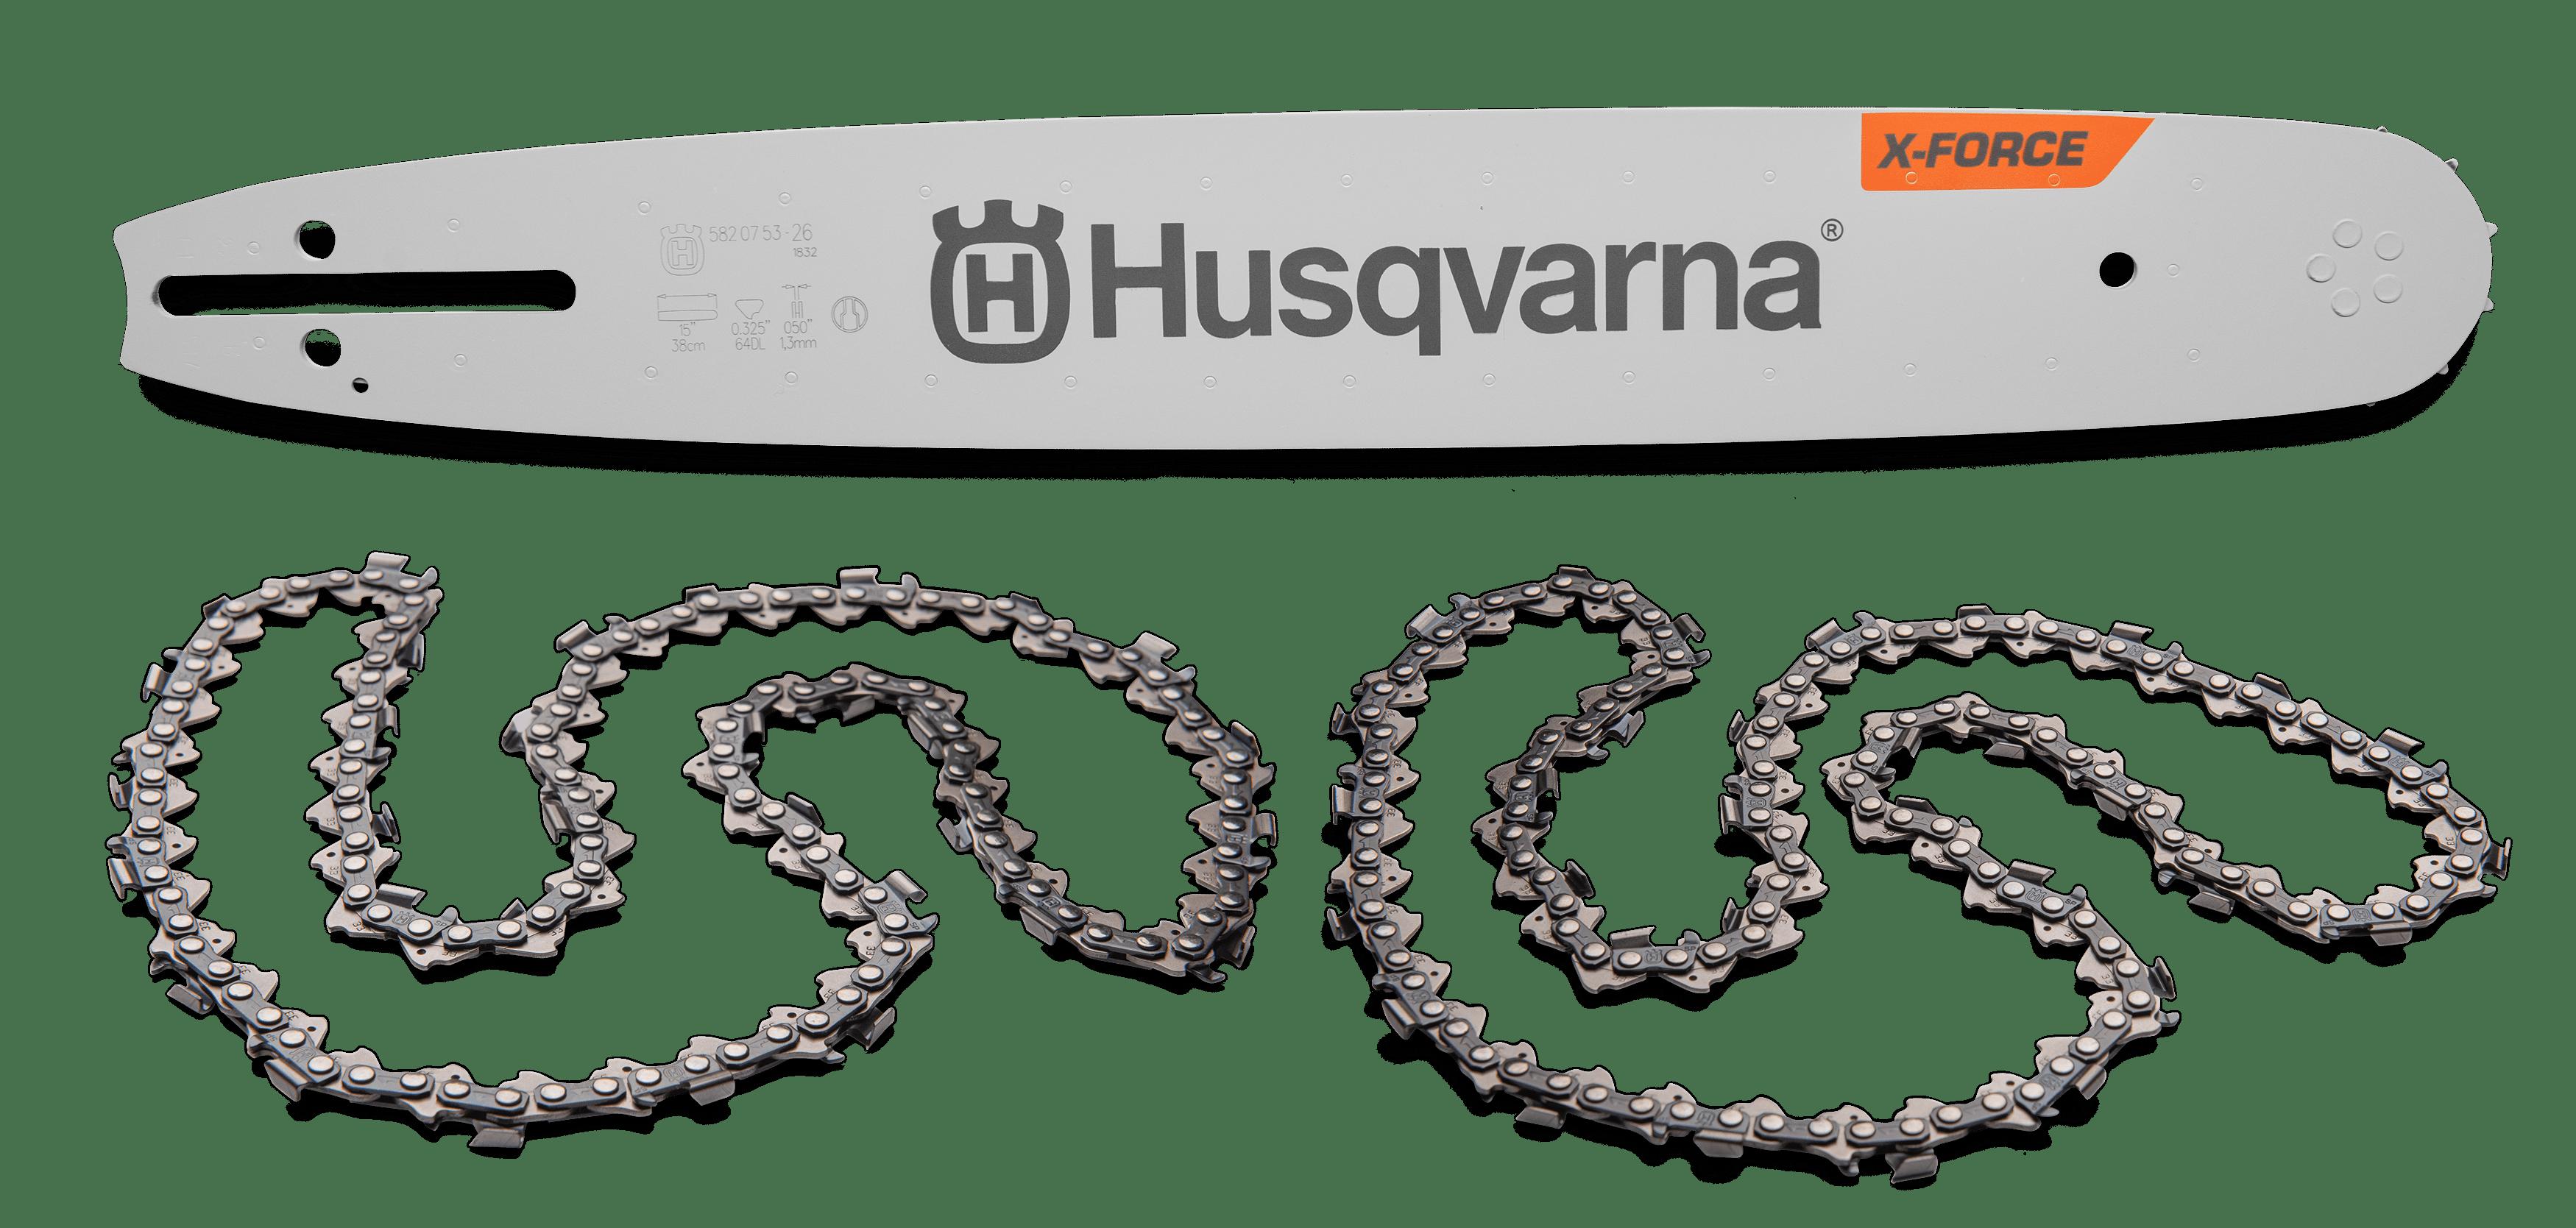 "Husqvarna Terälevy-ketjupaketti H25 .325"" 1,5 mm 13"" 56 L SN/A"